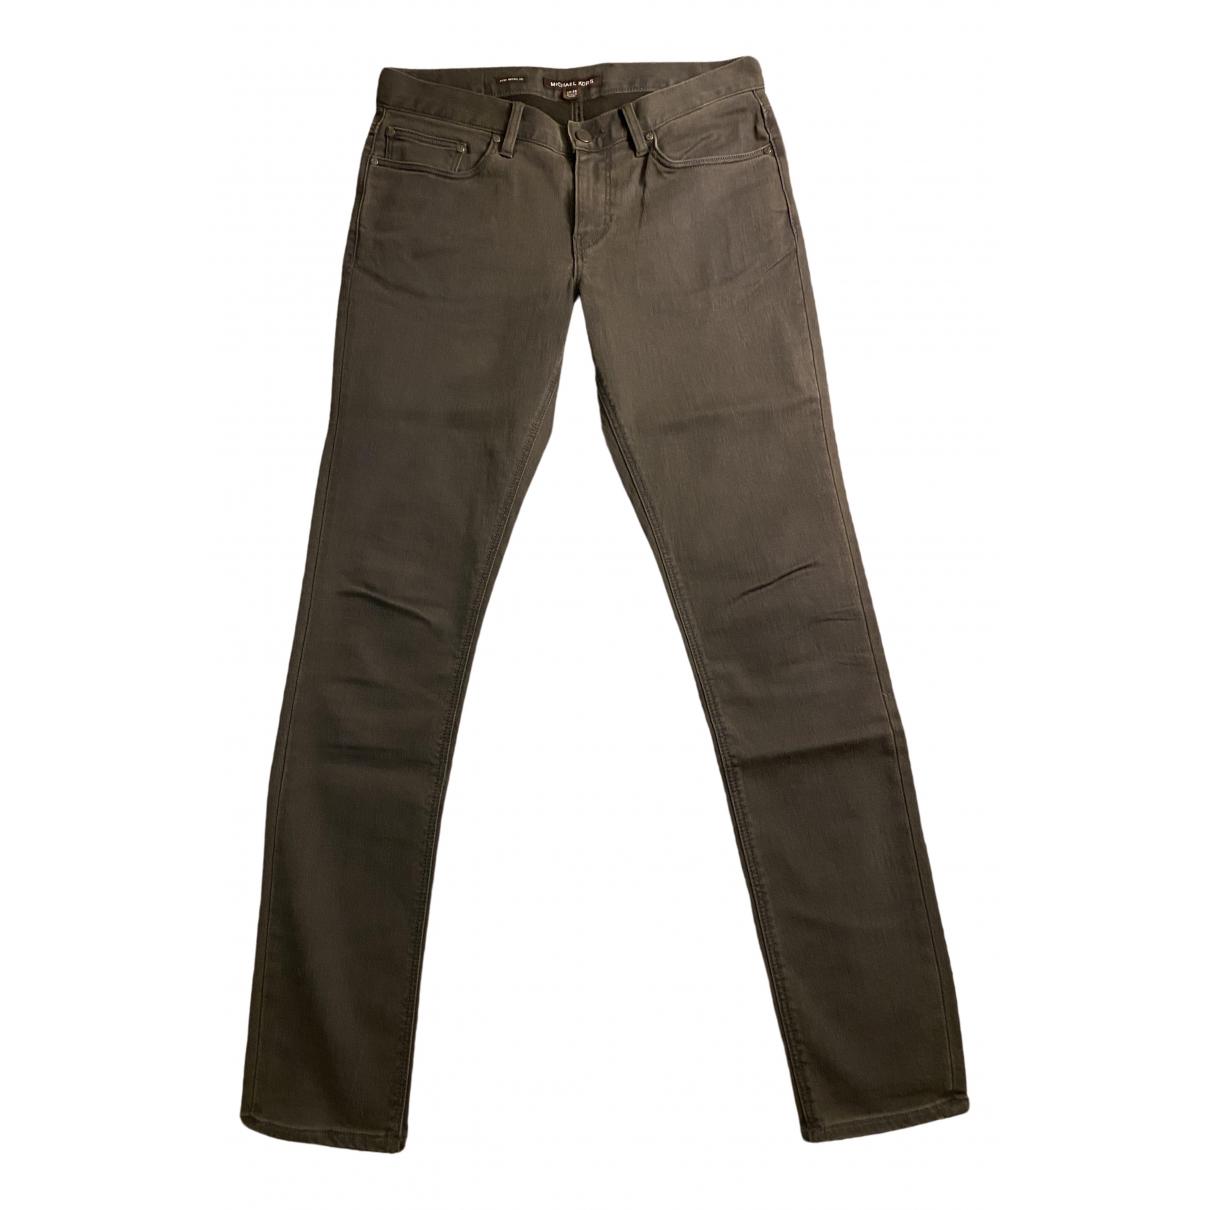 Michael Kors \N Grey Cotton - elasthane Jeans for Men 30 US